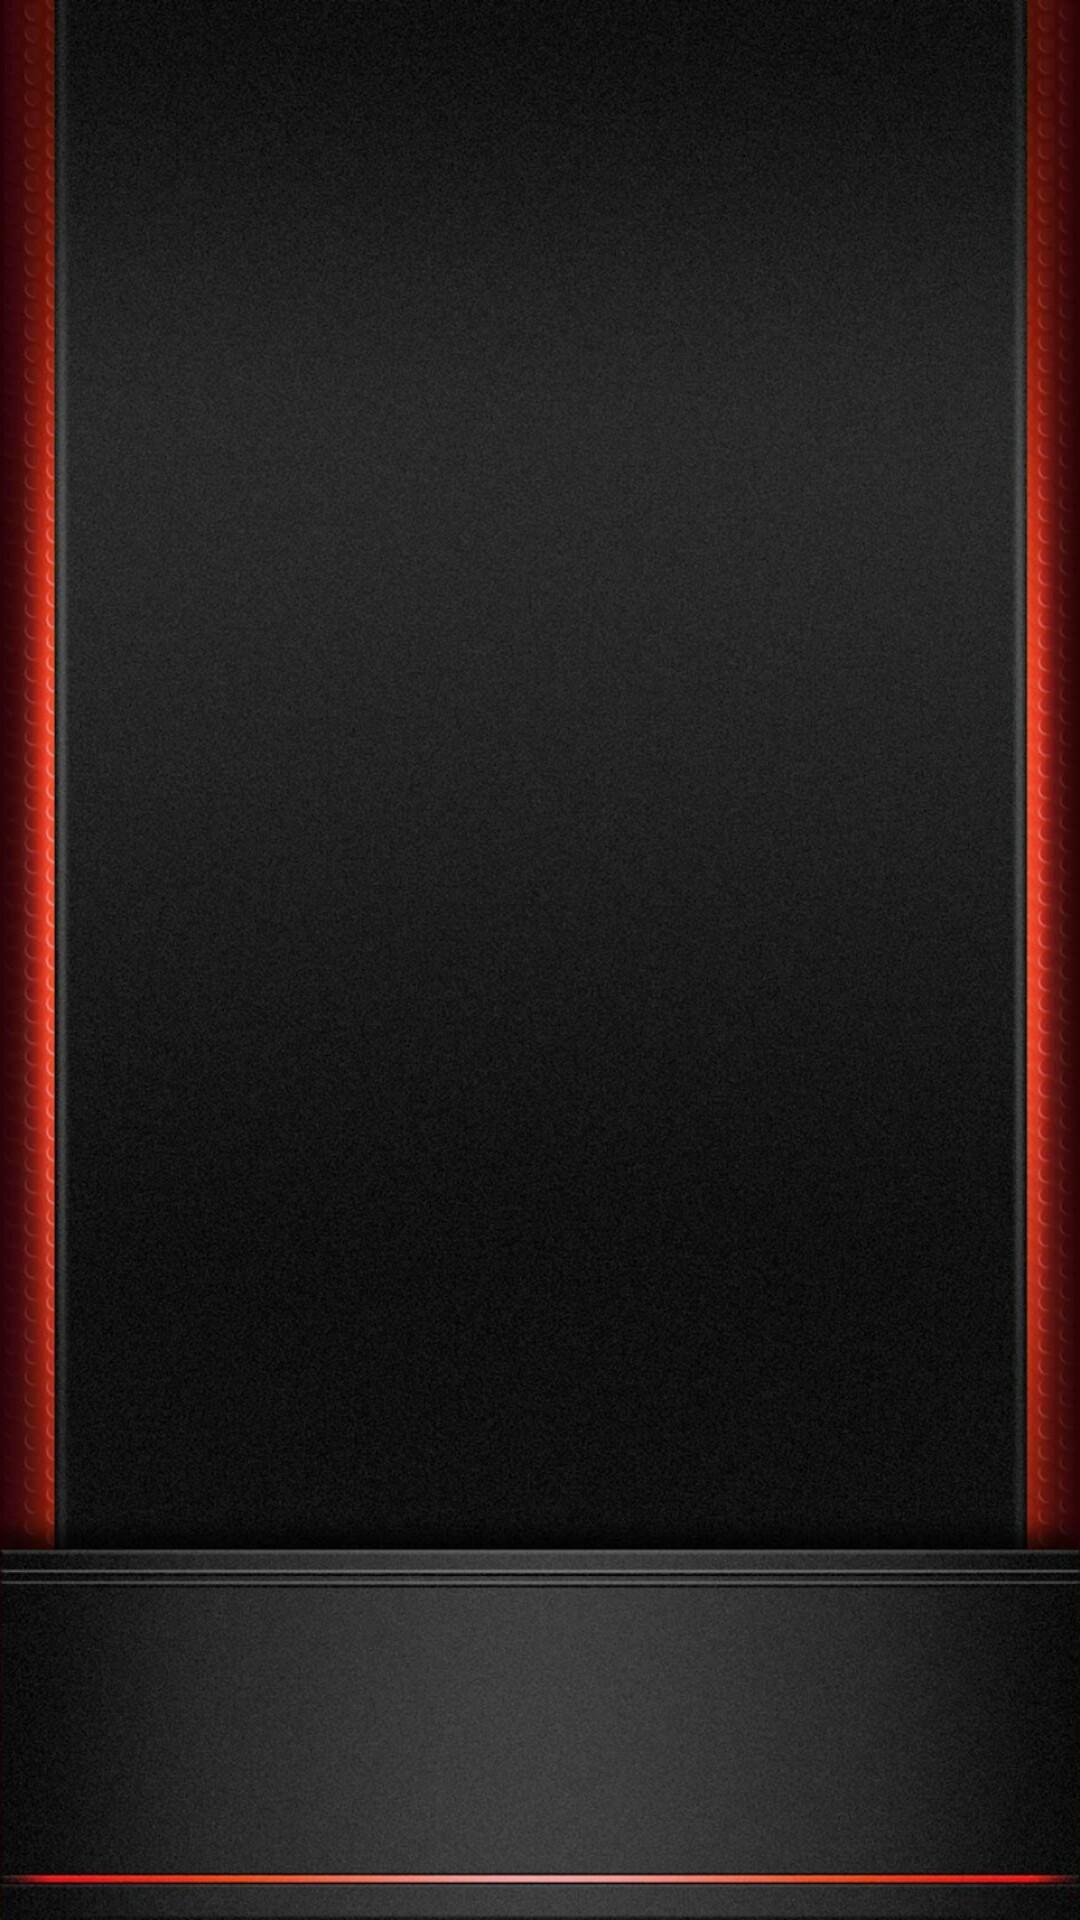 Black Screen Wallpaper (70+ images)